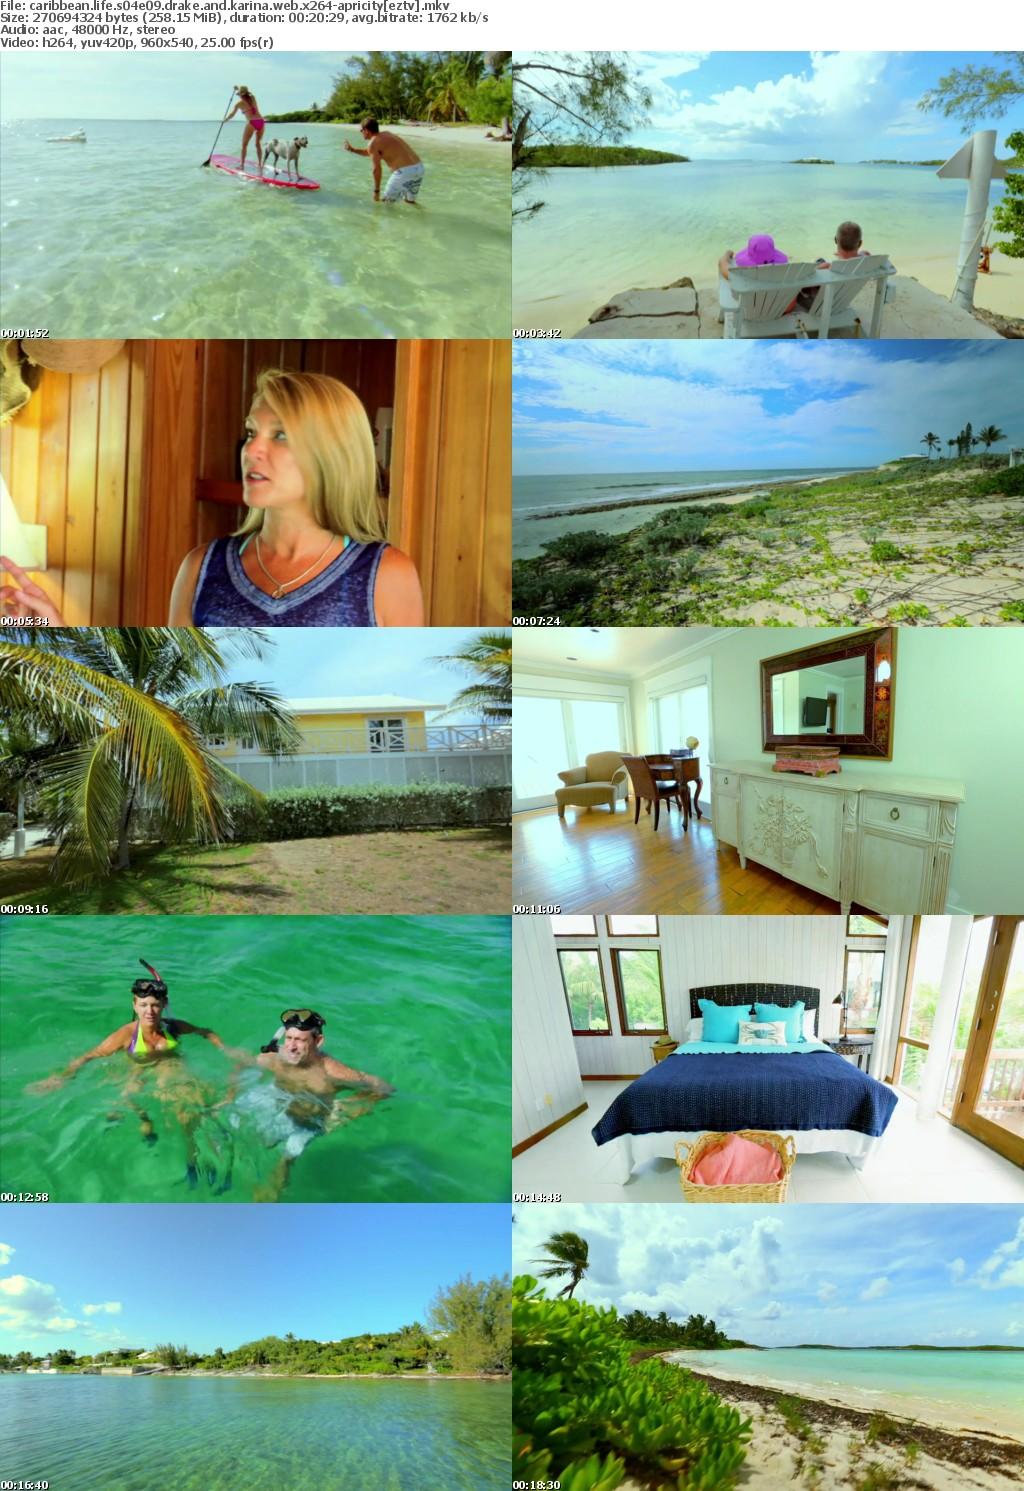 Caribbean Life S04E09 Drake and Karina WEB x264-APRiCiTY